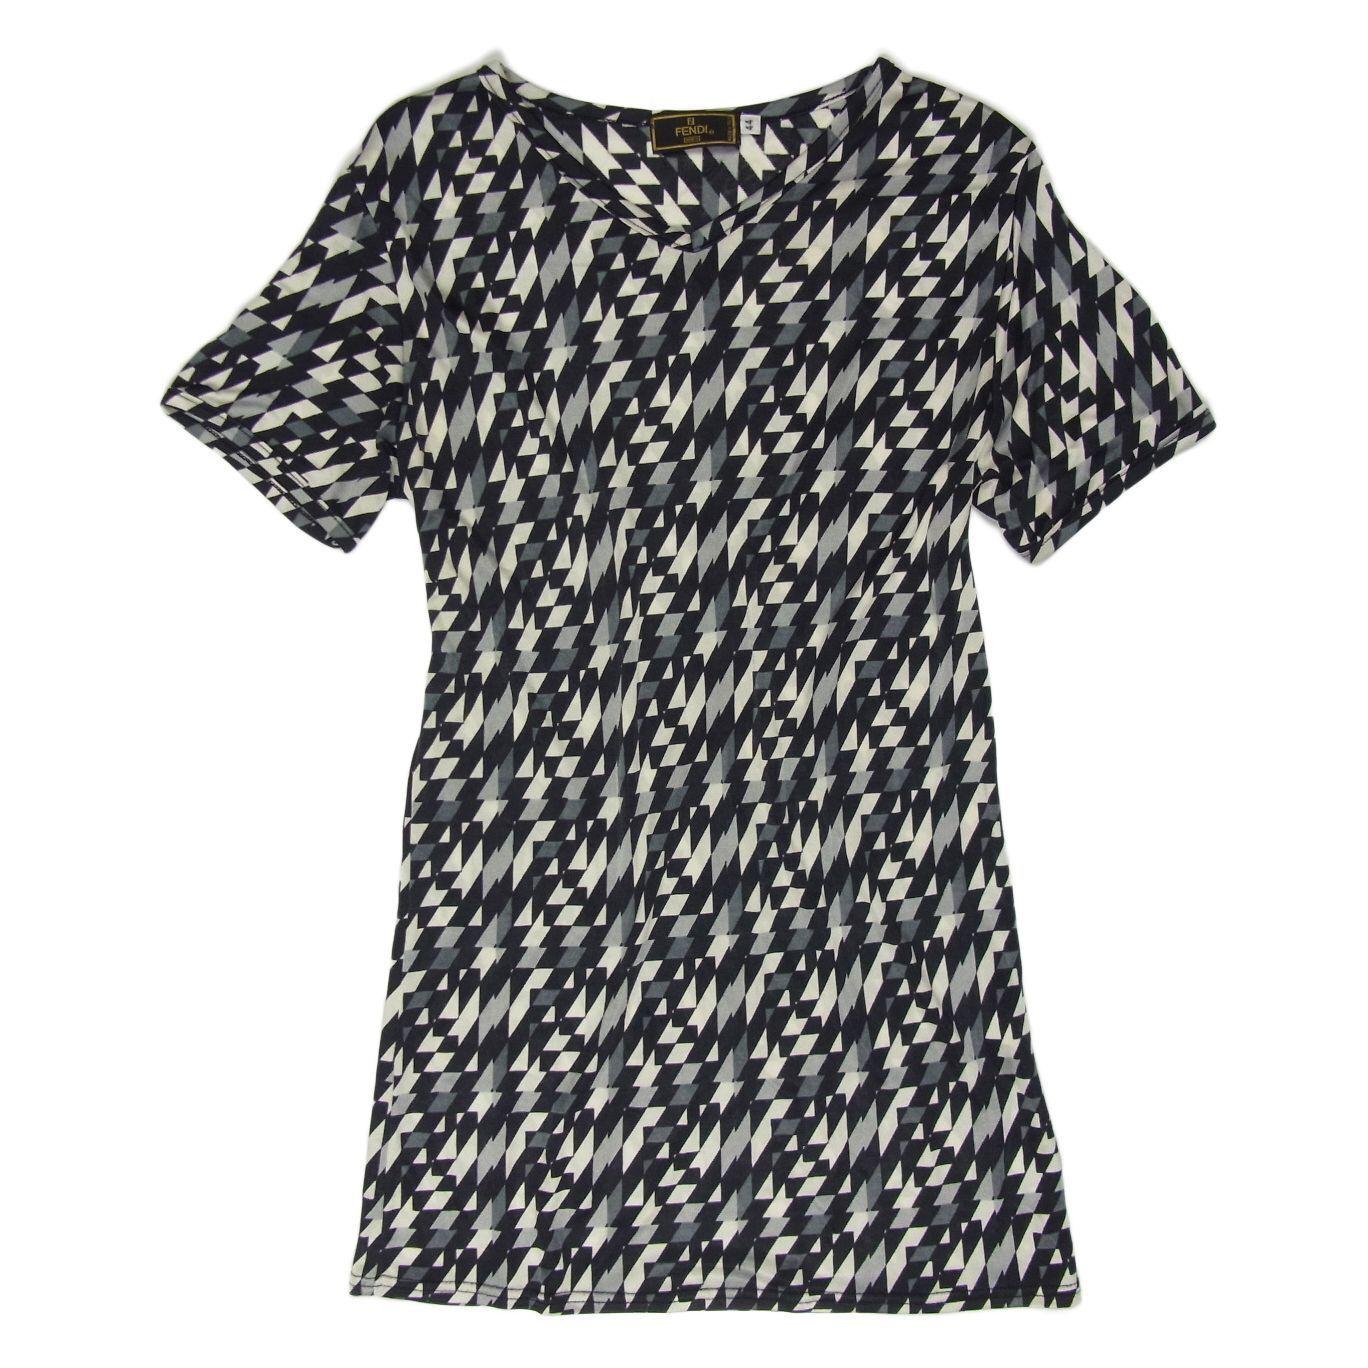 Auth FENDI Logos Stripe Pattern Stretchable Shirt Top Sz 44 US L F S 376